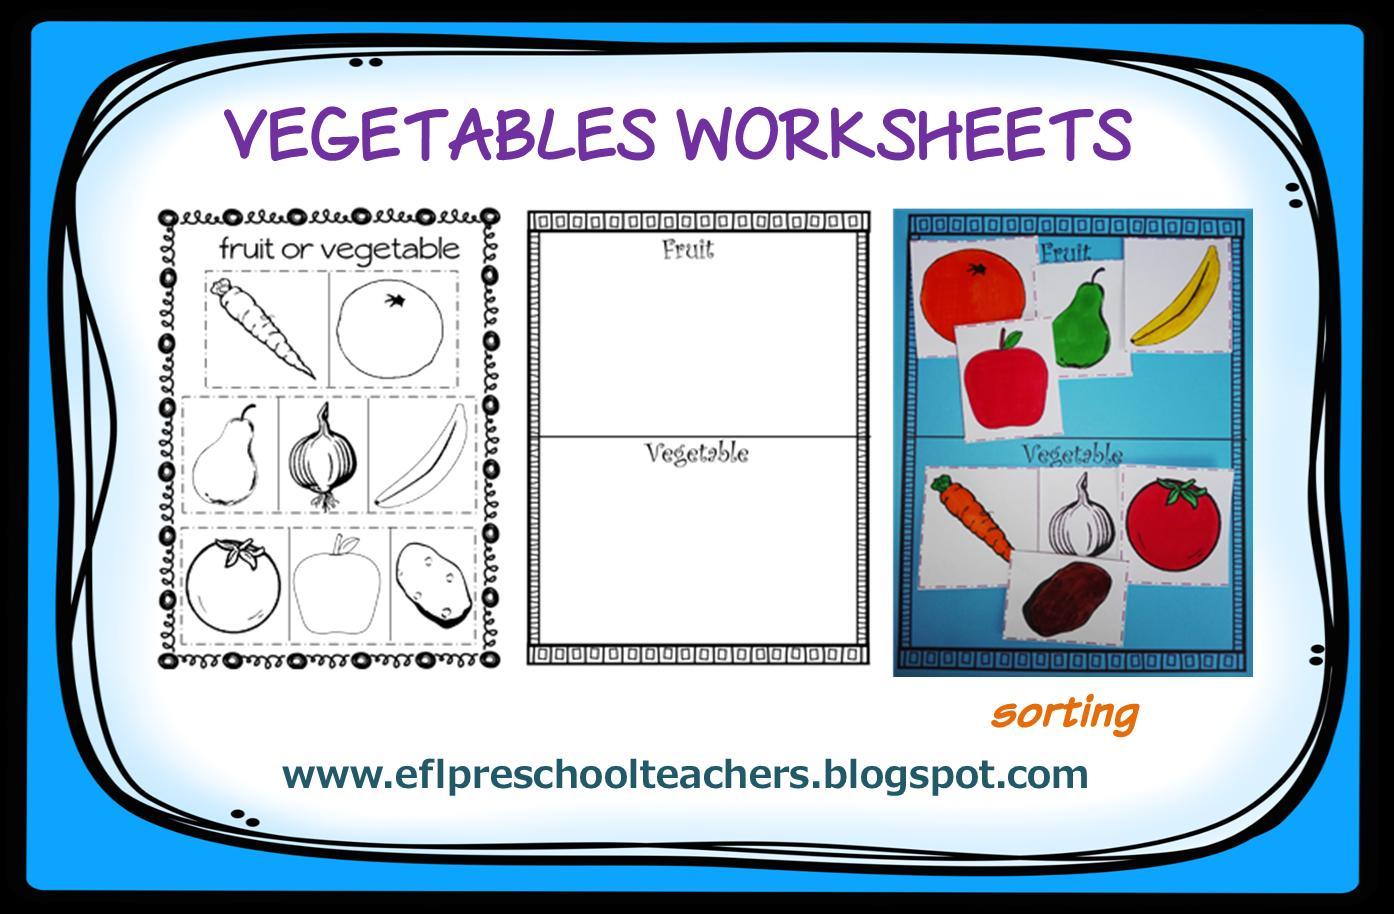 Vegetable Worksheet For Nursery Class